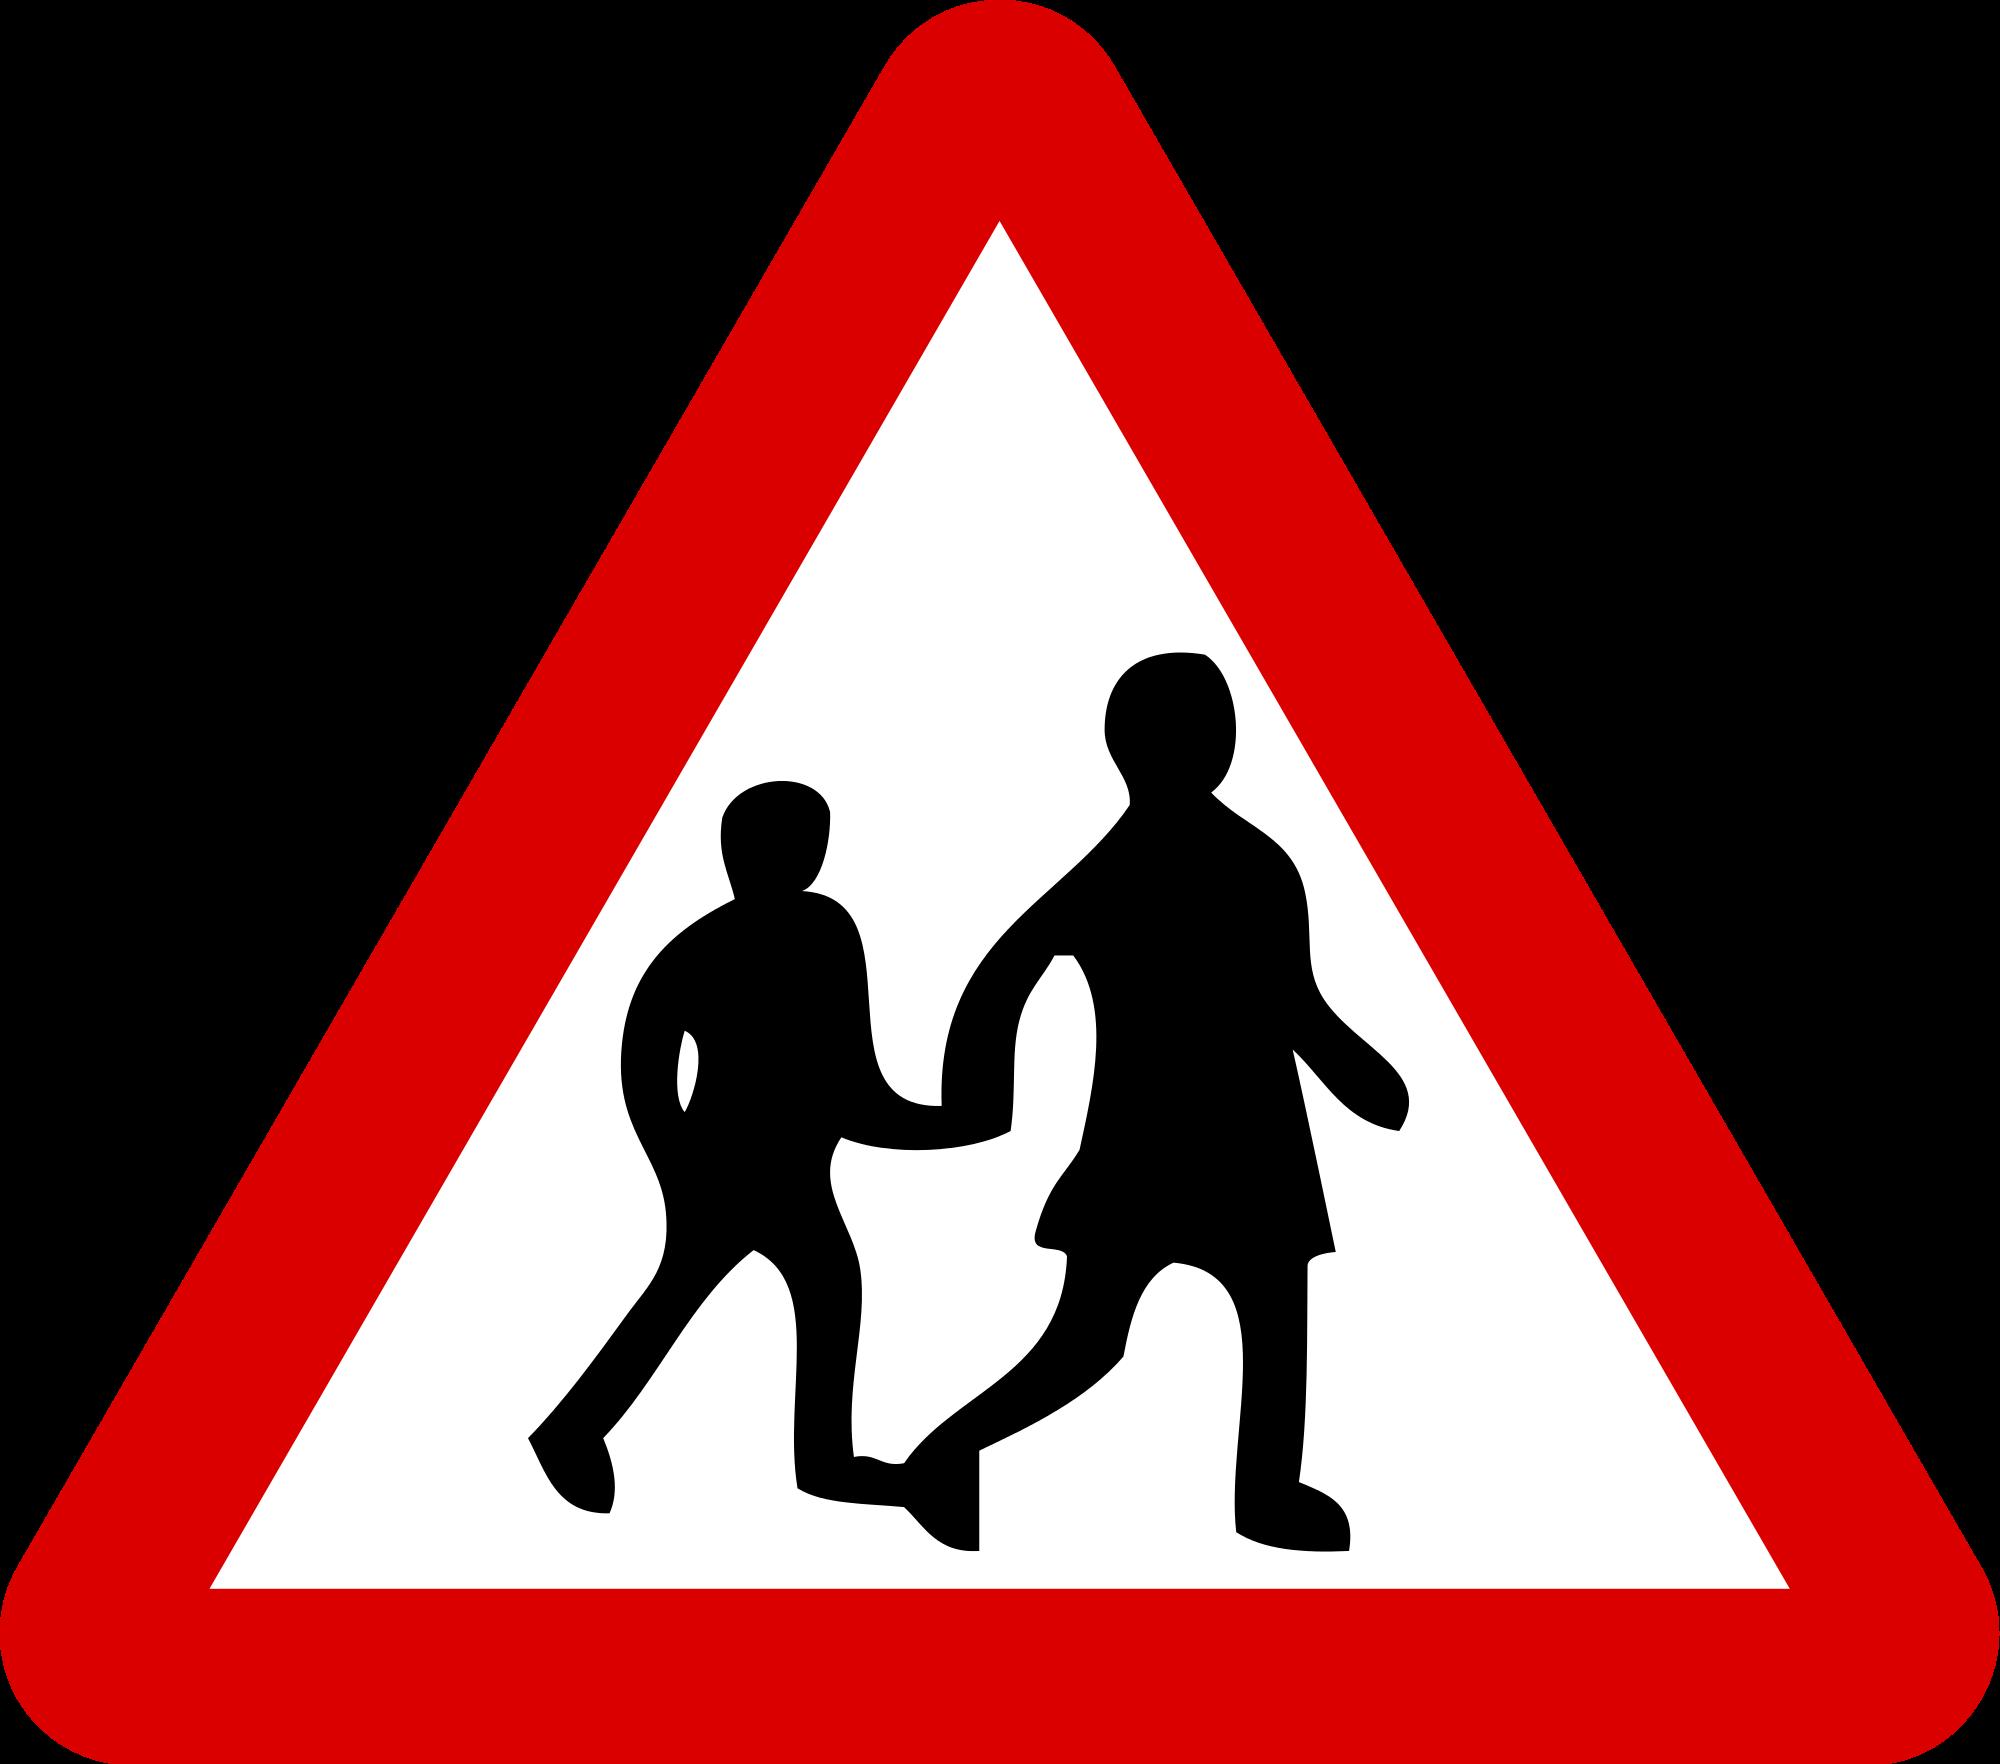 Clipart school sign, Clipart school sign Transparent FREE.